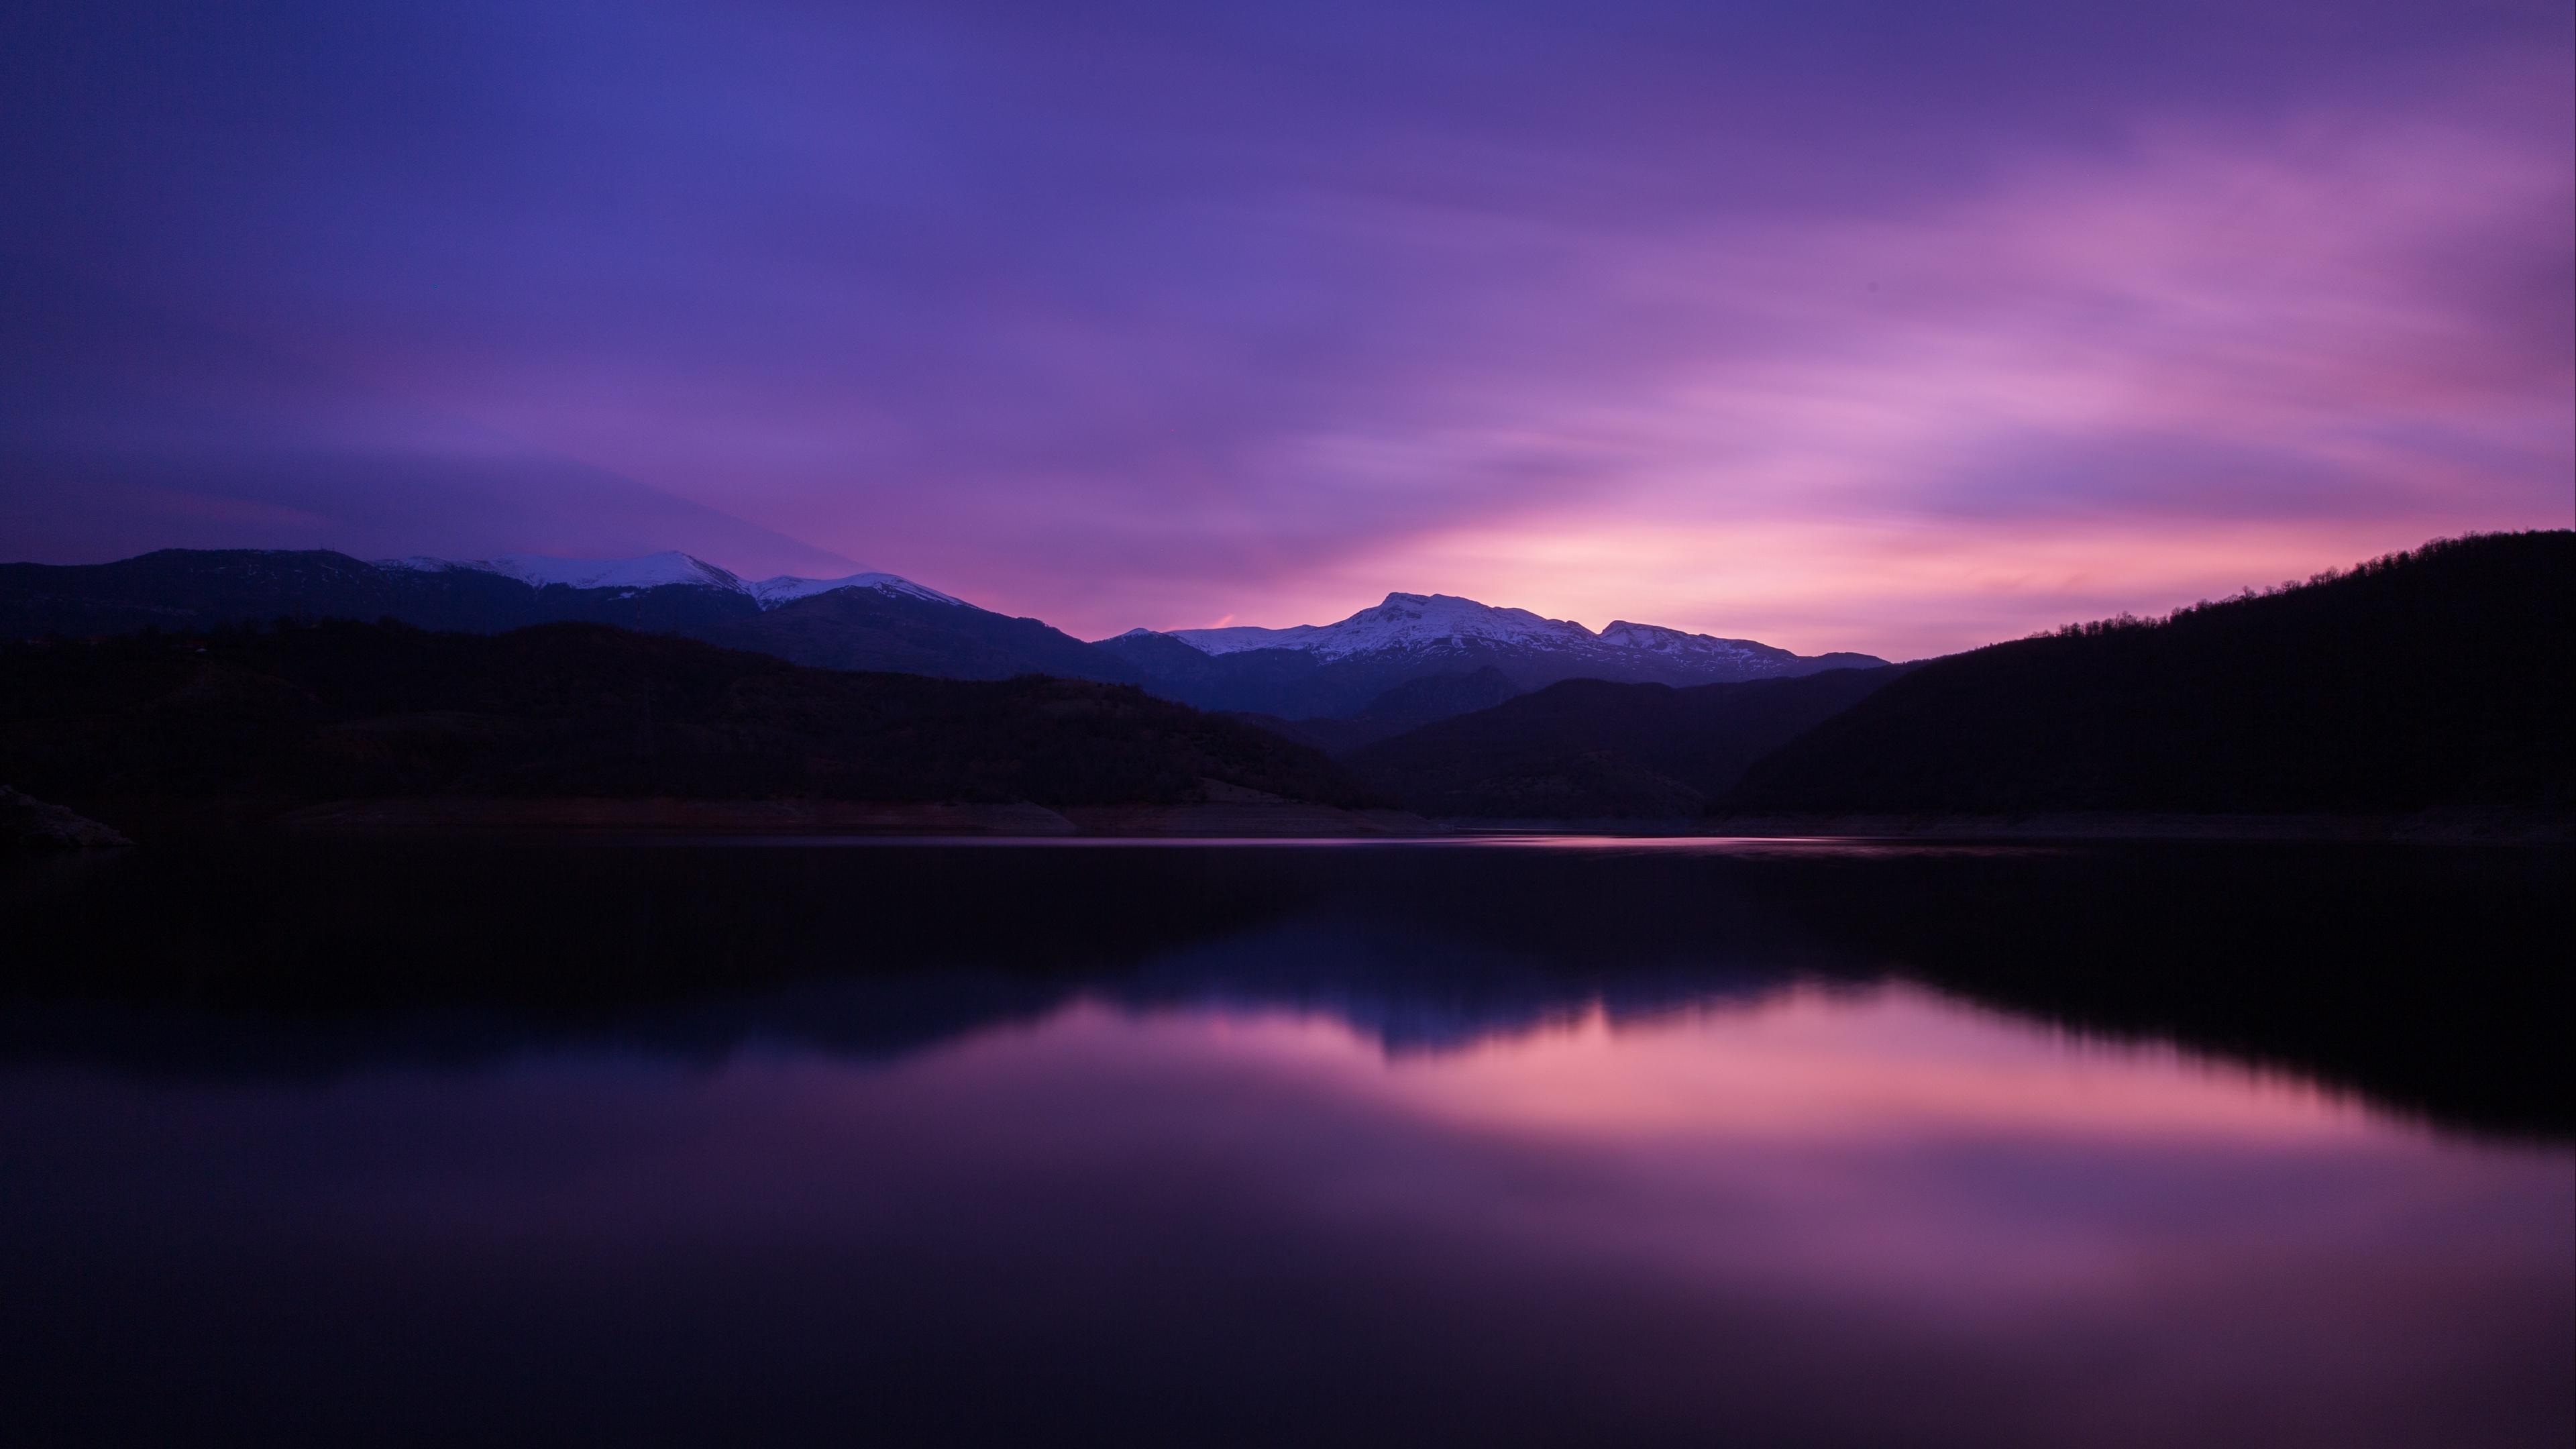 mountains lake night reflection 4k 1541115017 - mountains, lake, night, reflection 4k - Night, Mountains, Lake